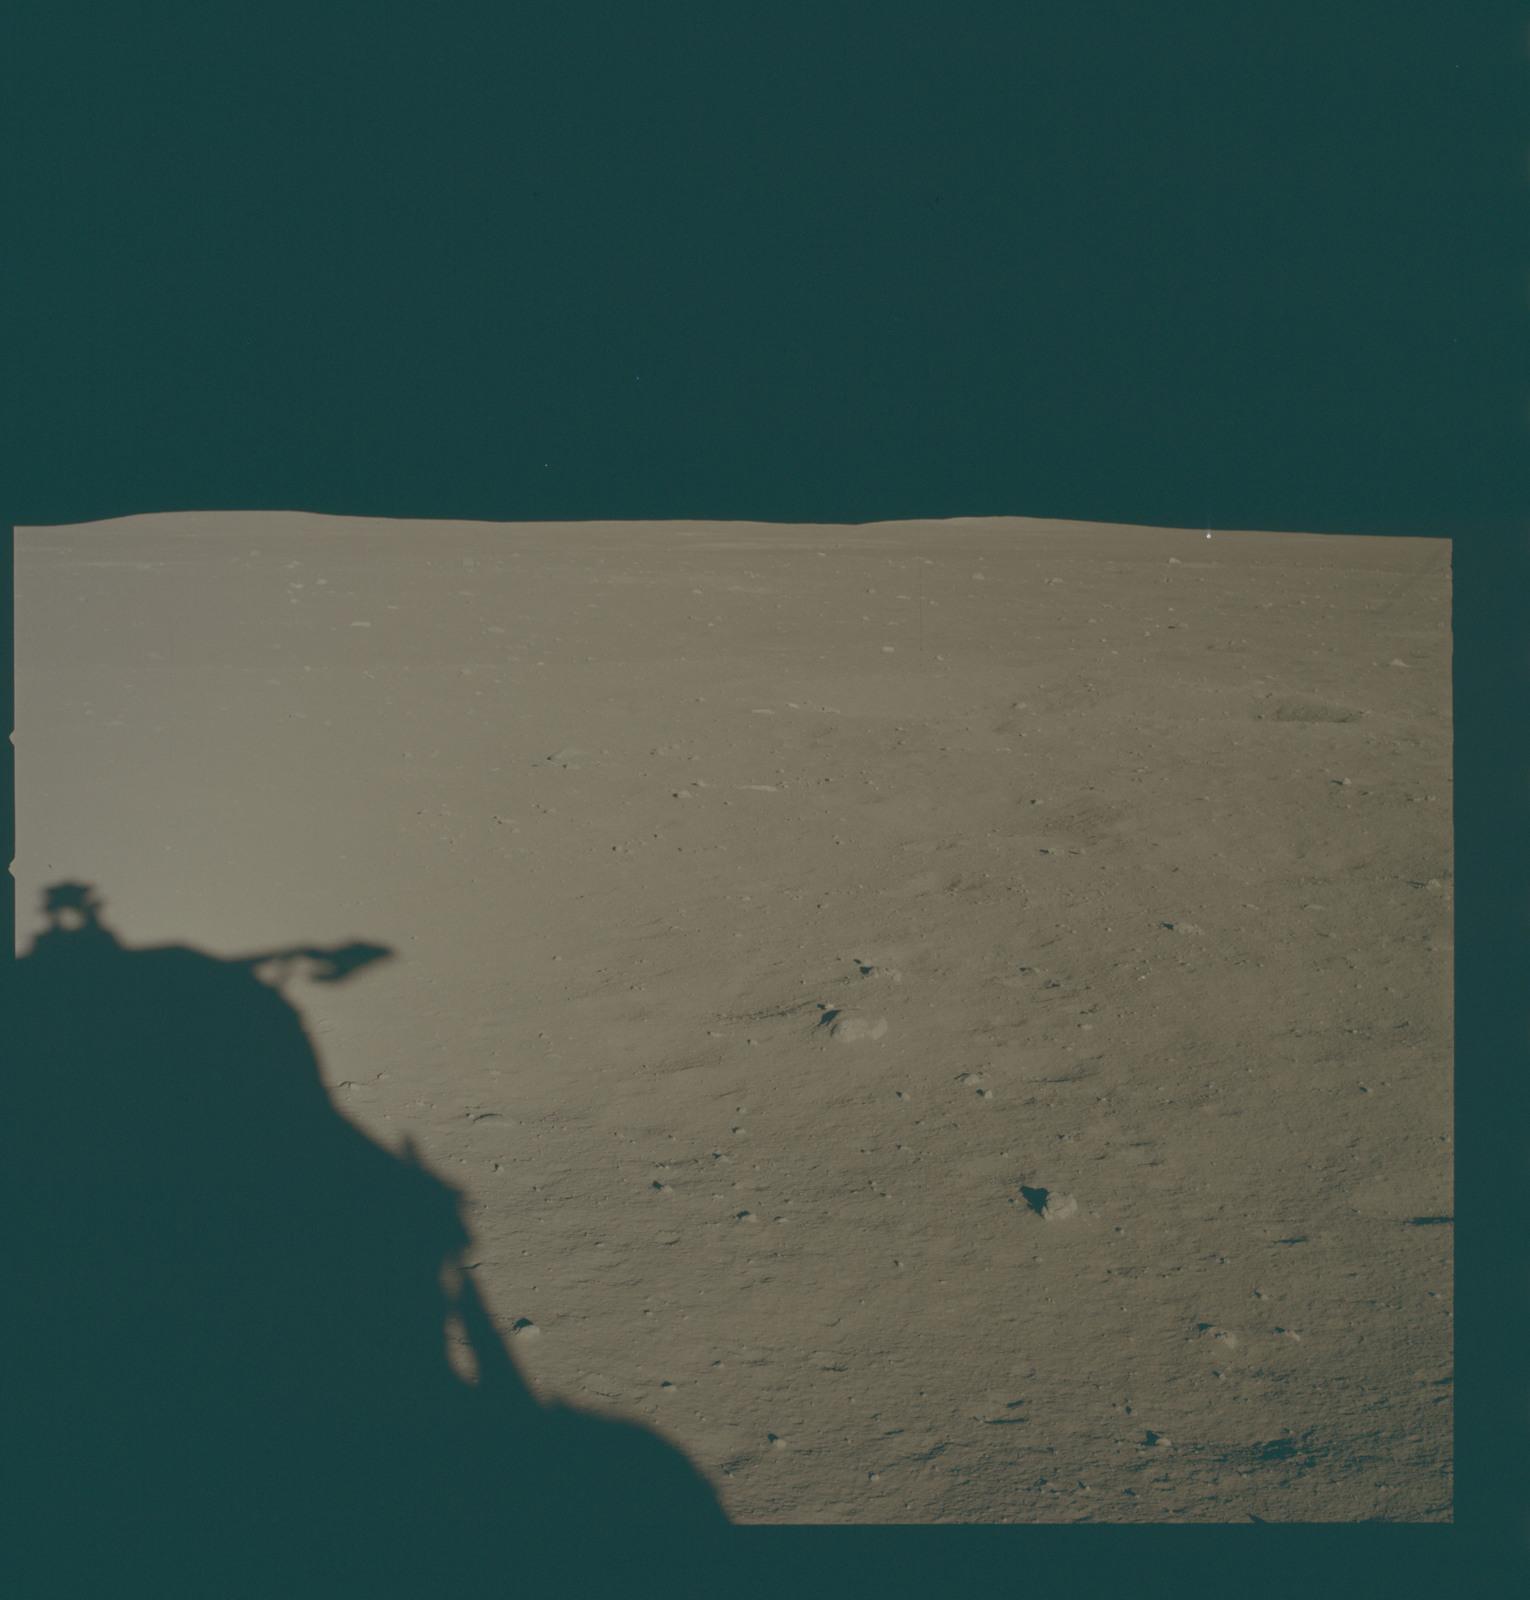 AS11-37-5455 - Apollo 11 - Apollo 11 Mission image - Lunar horizon from Tranquility Base